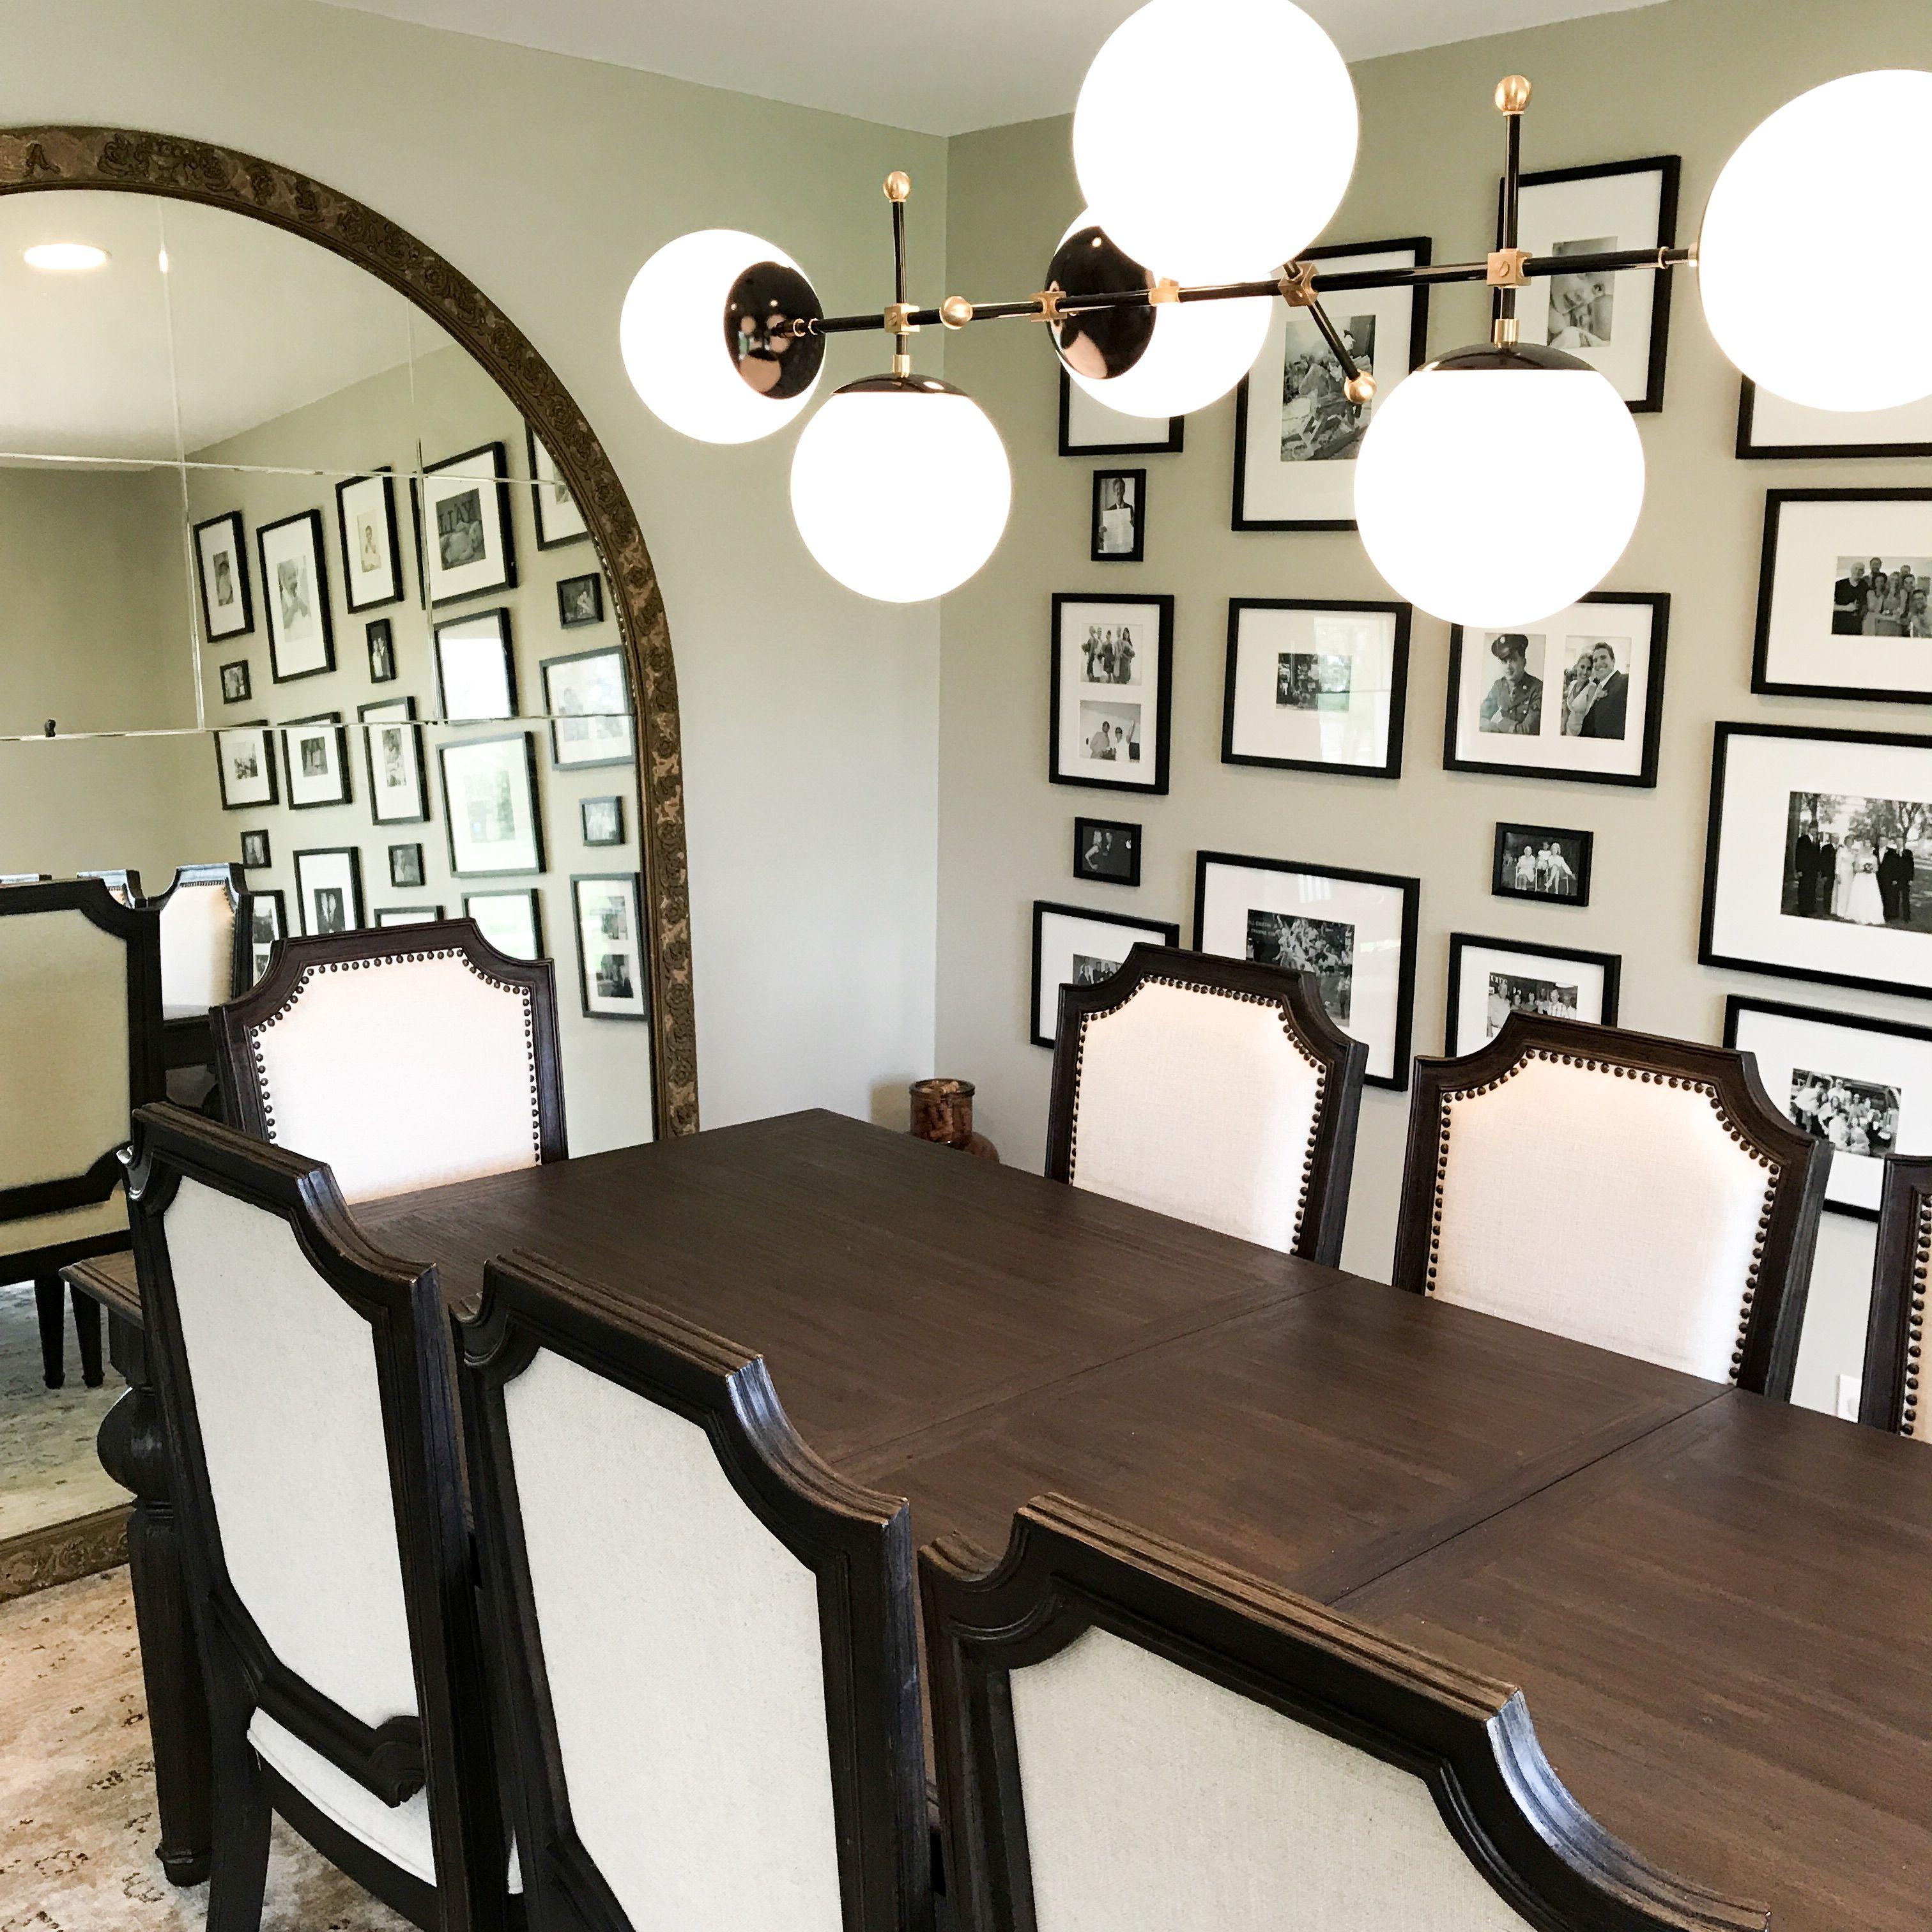 Black And Brass Cumula Globe Chandelier In Dining Room Wayzata MN